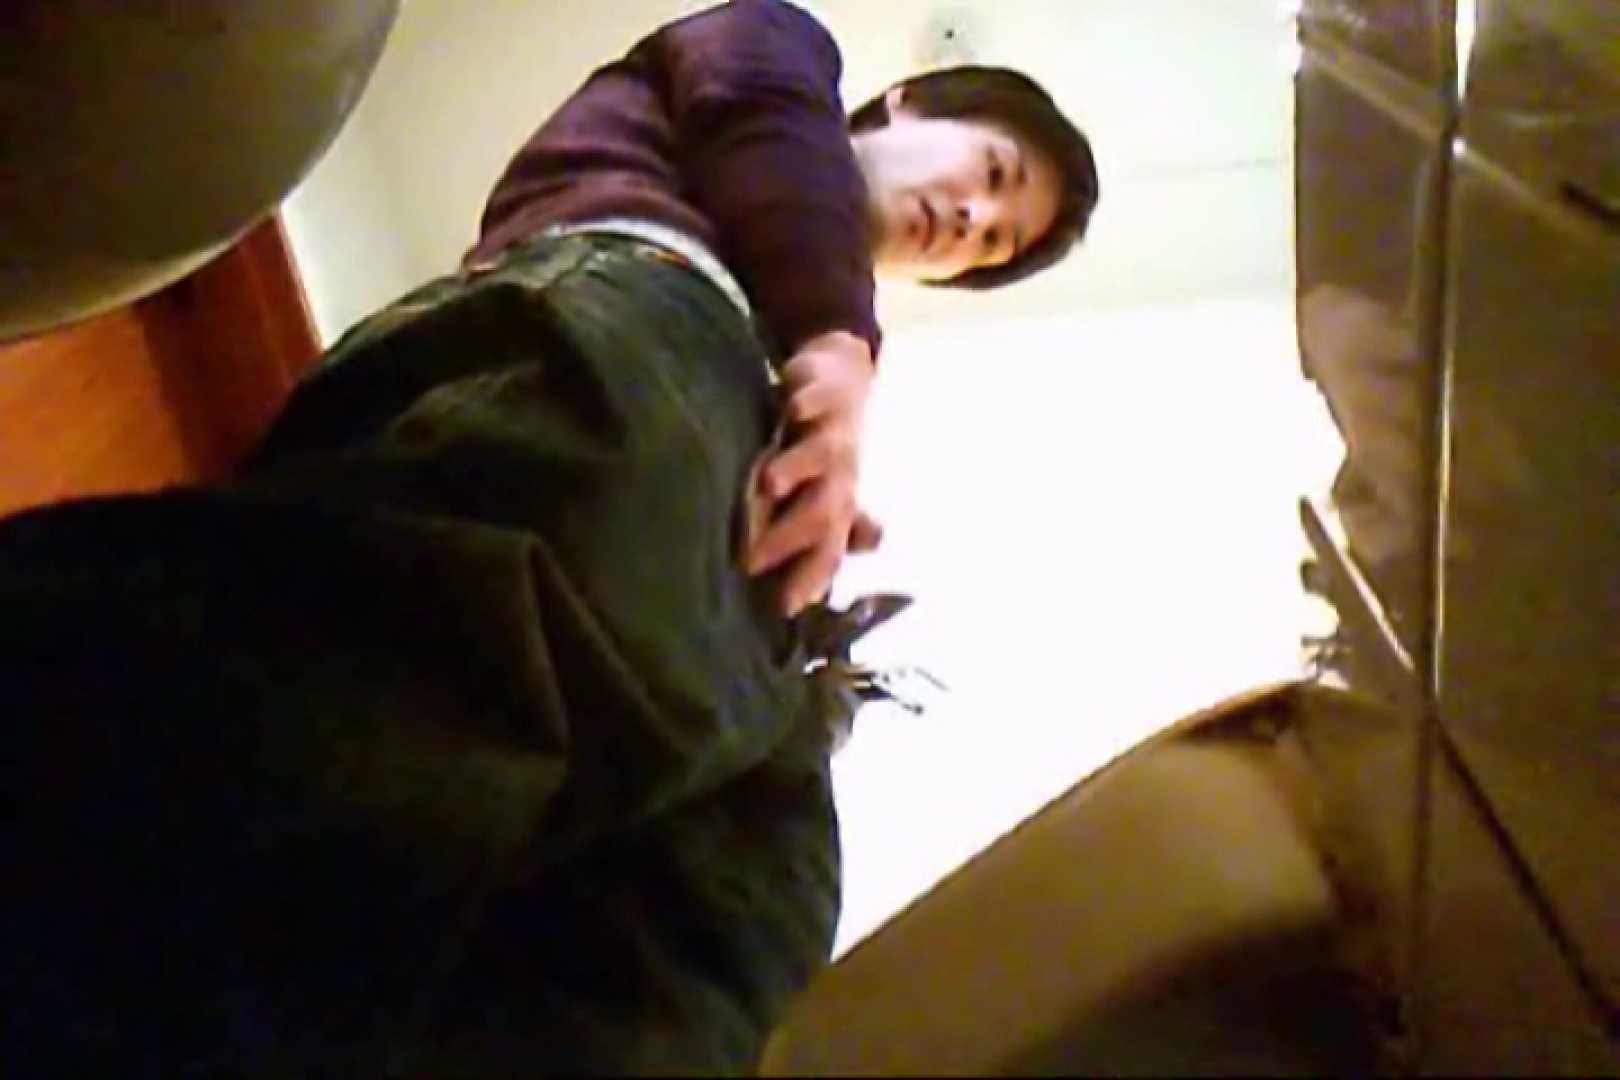 Gボーイ初投稿!掴み取りさんの洗面所覗き!in新幹線!VOL19 ノンケ ゲイセックス画像 27連発 20